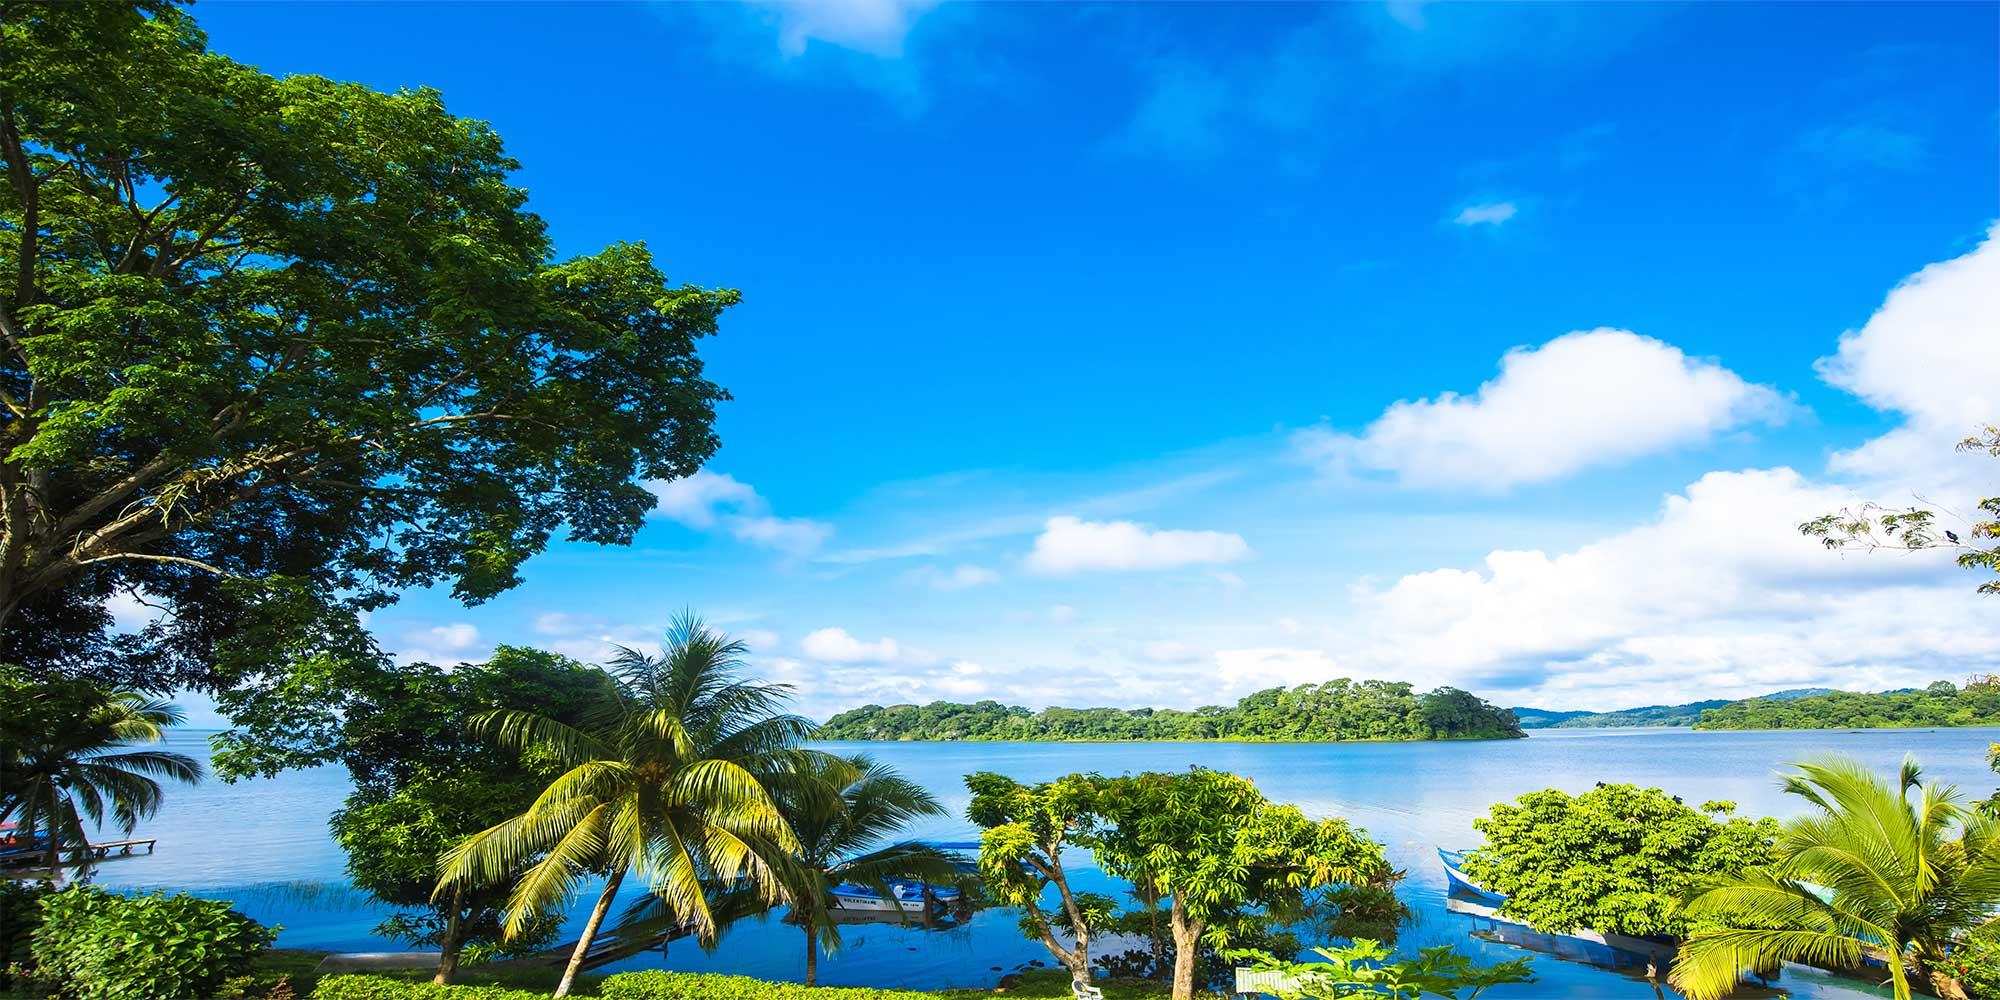 Rio-San-Juan-Nicaragua